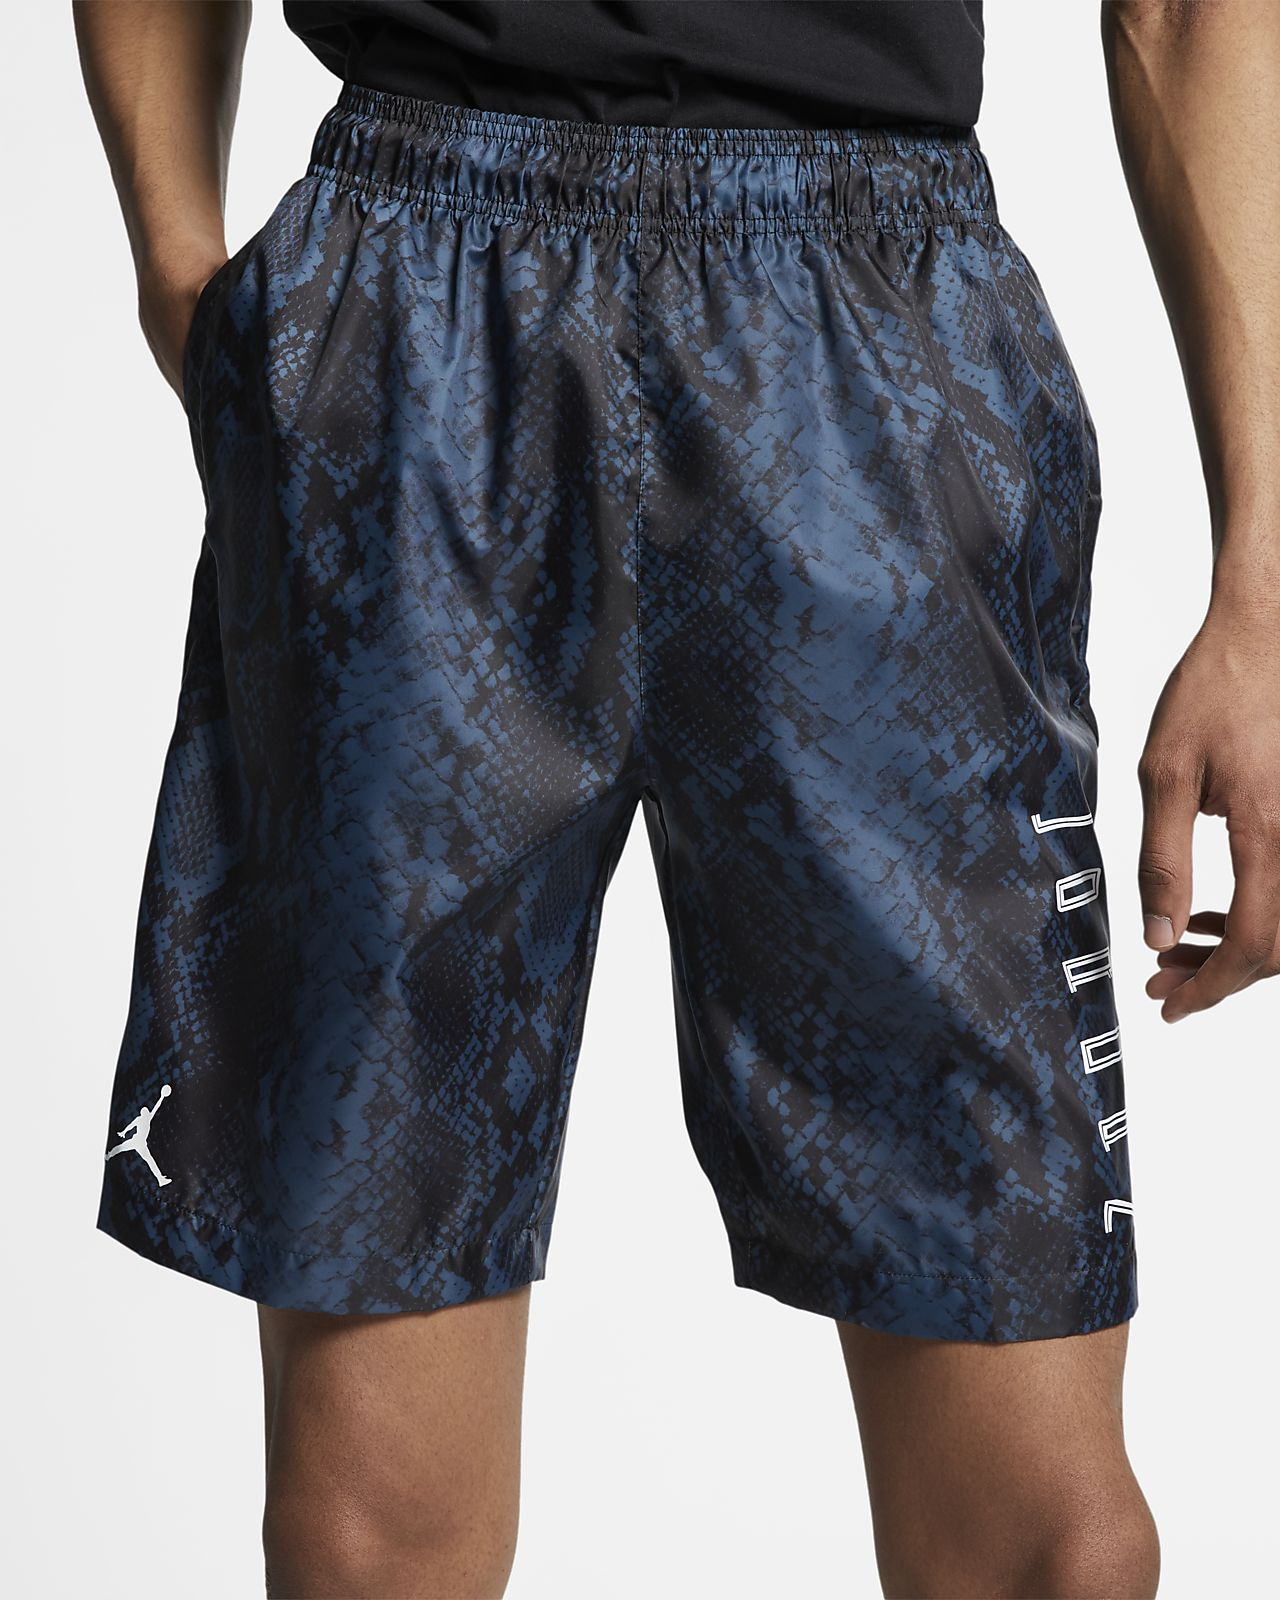 8f8872d7822 Low Resolution Jordan AJ11 Snakeskin Men's Shorts Jordan AJ11 Snakeskin  Men's Shorts